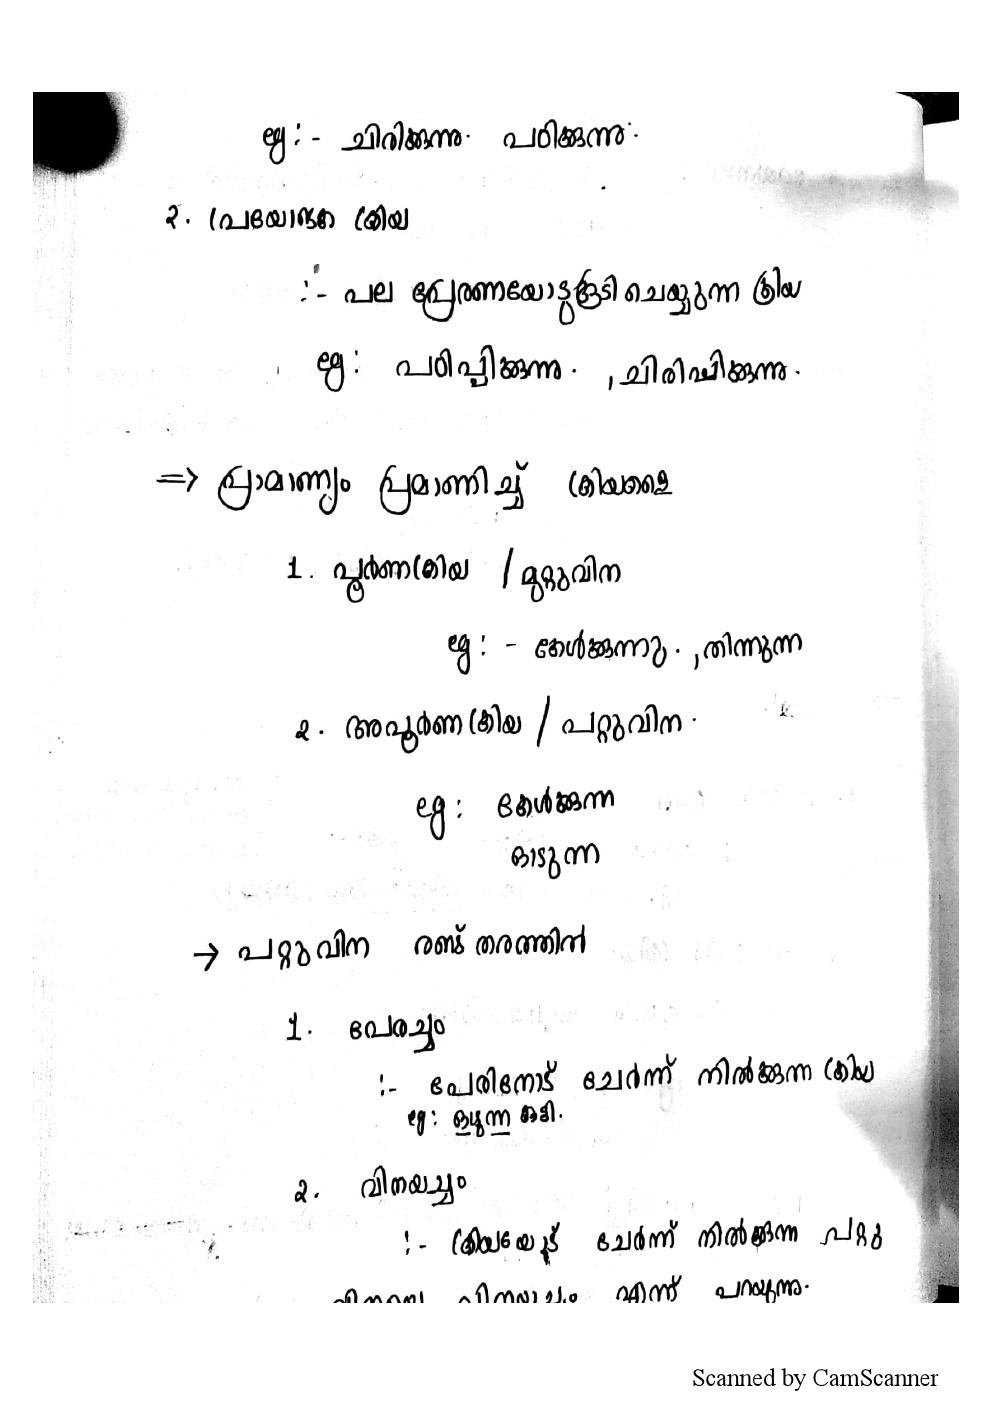 http://masterstudy.net/pdf/ktet_notes0095.png